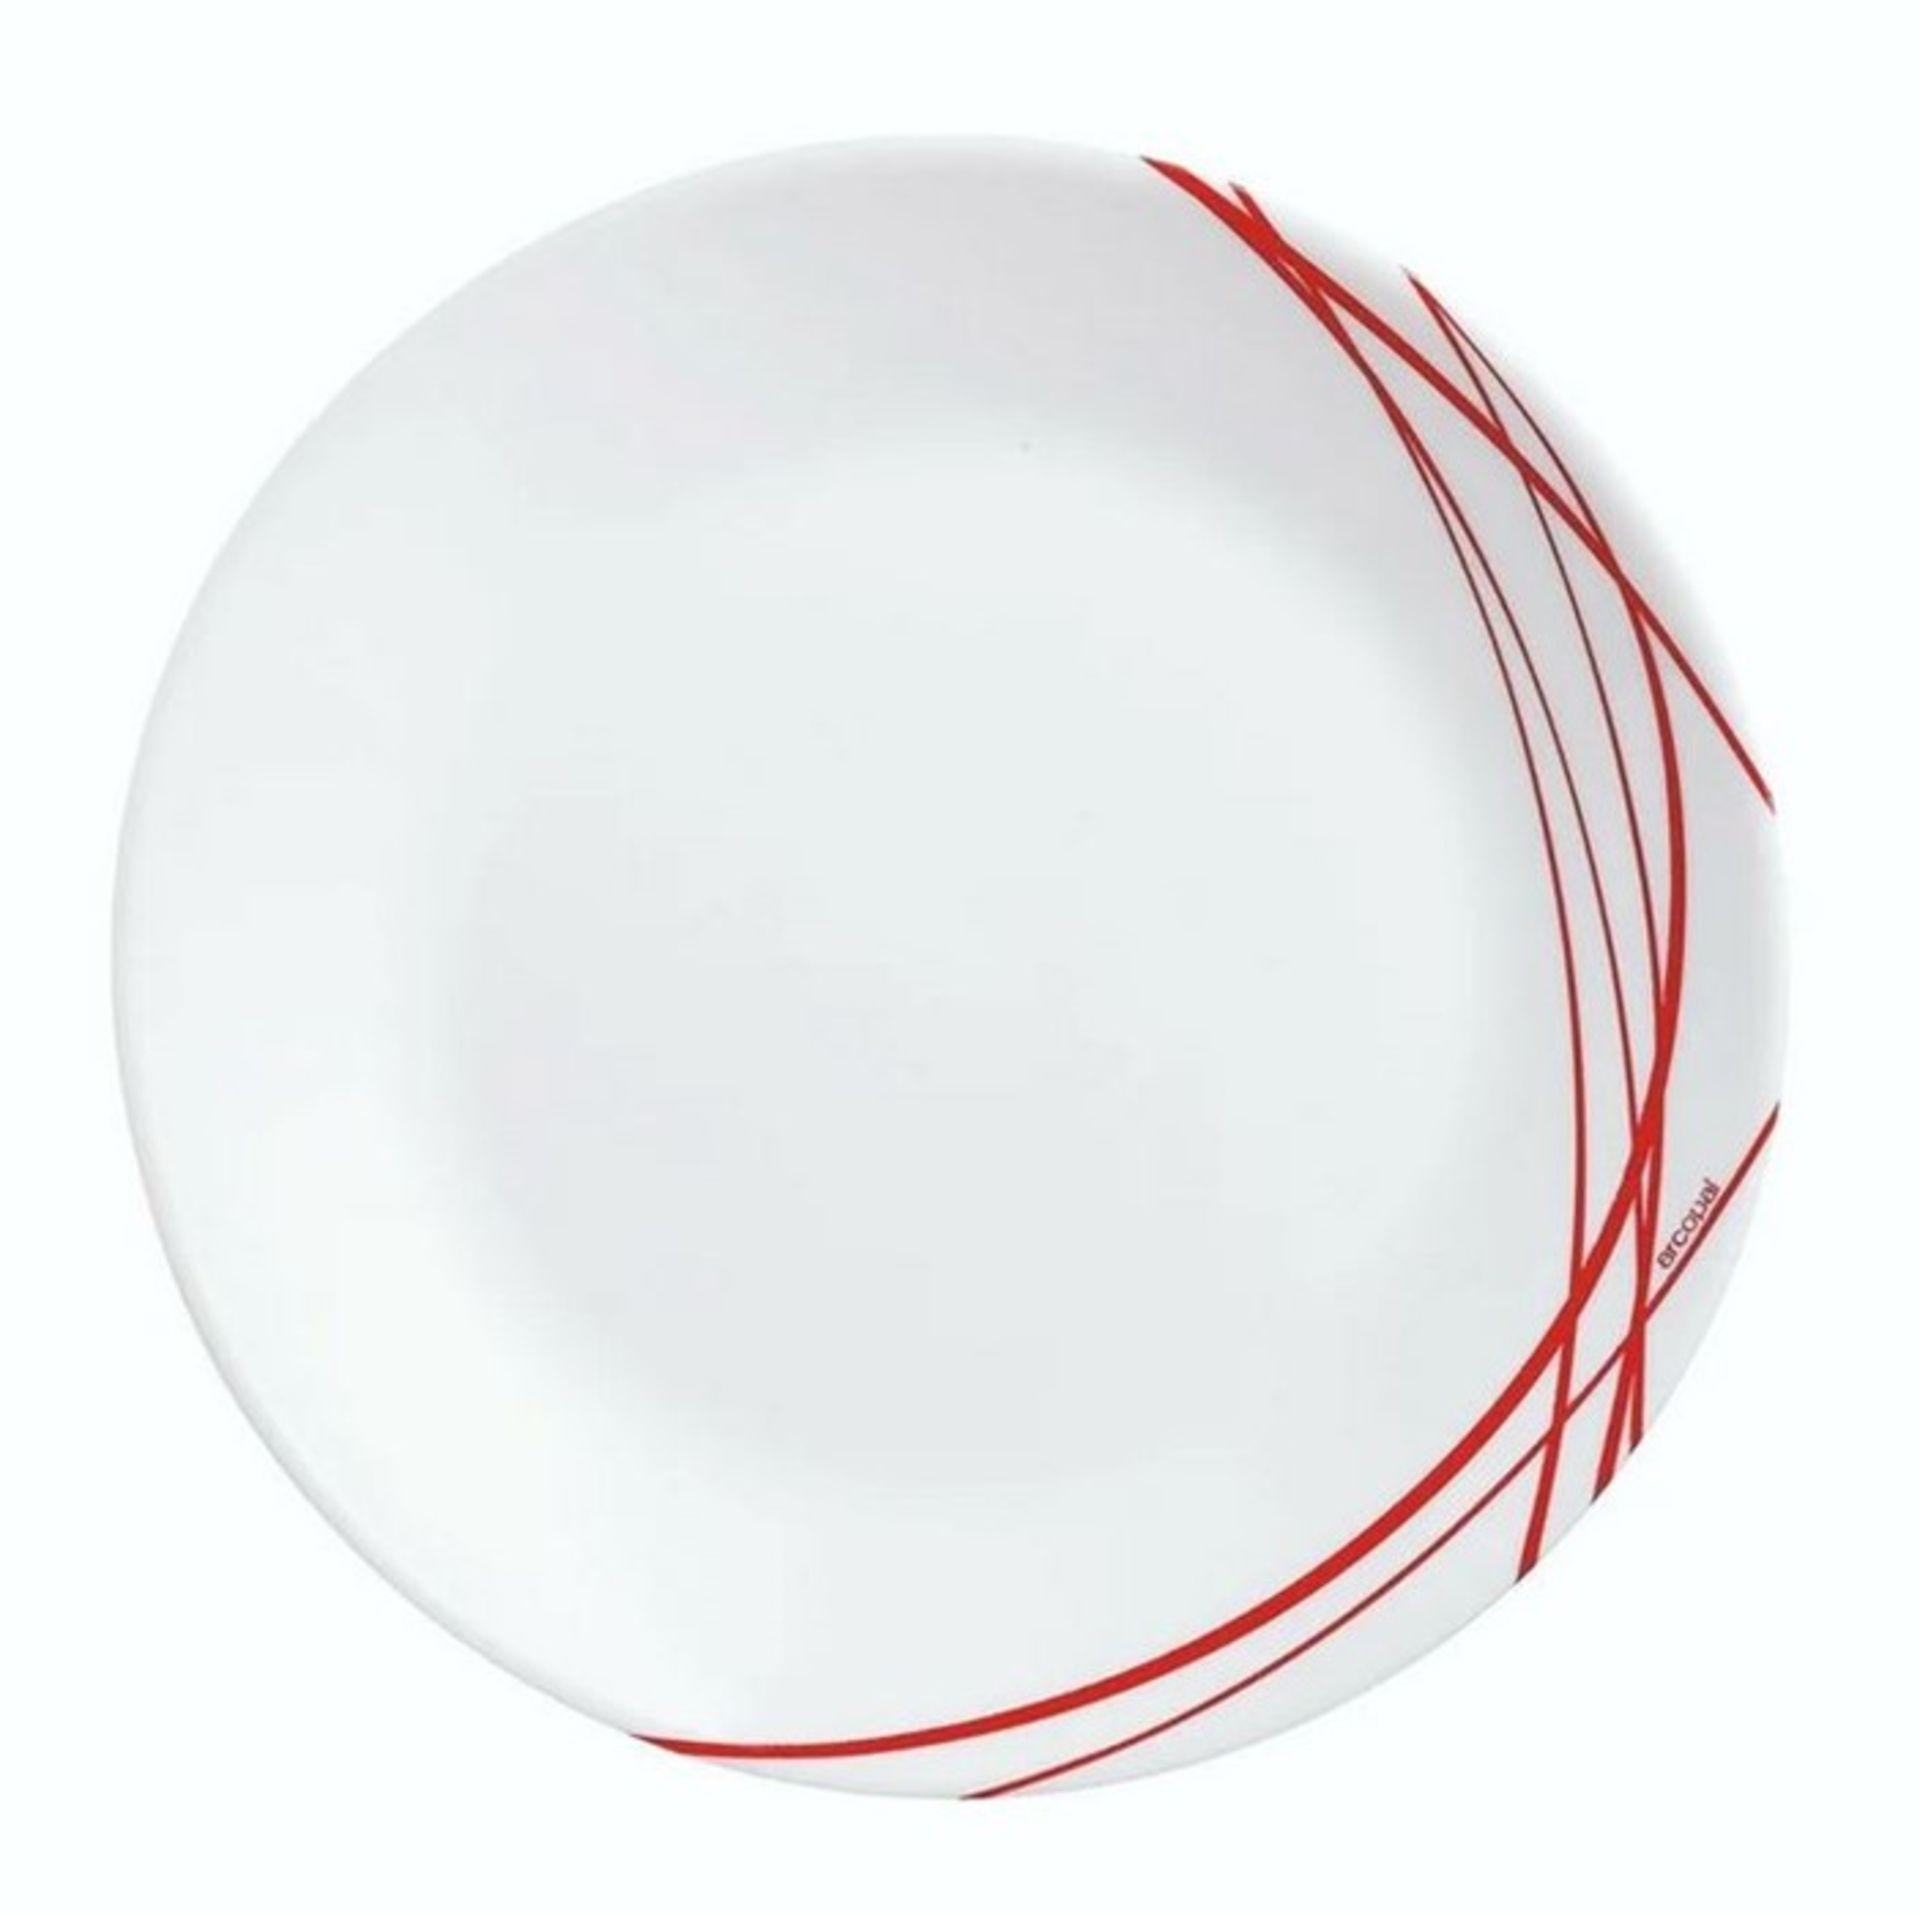 DOMITILLE 18 PIECE DINNERWARE SET, SERVICE FOR 6